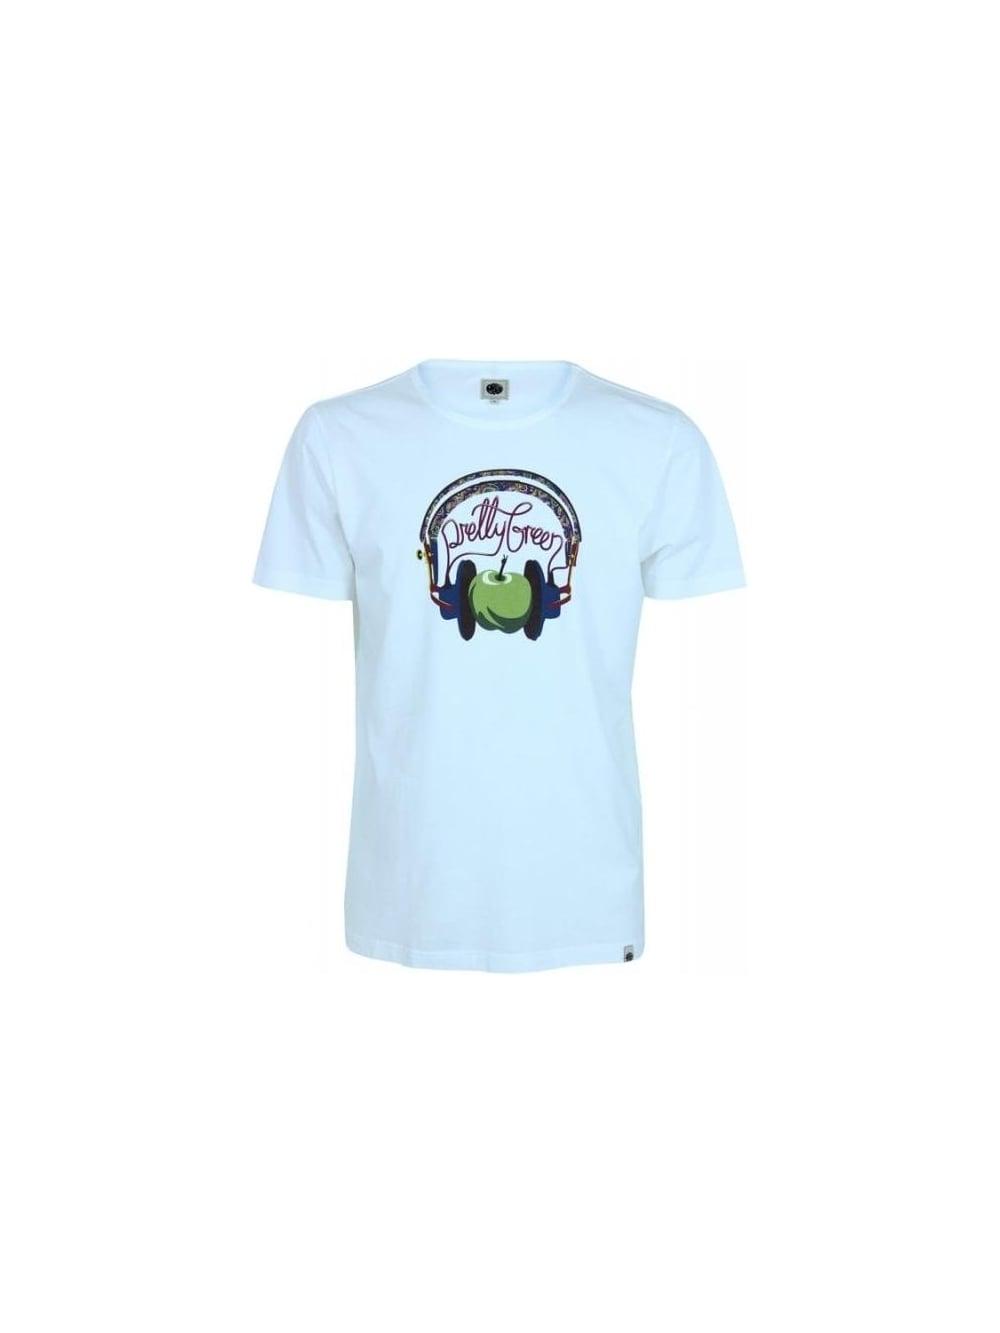 54be3dccf97 Pretty Green White T Shirt - BCD Tofu House